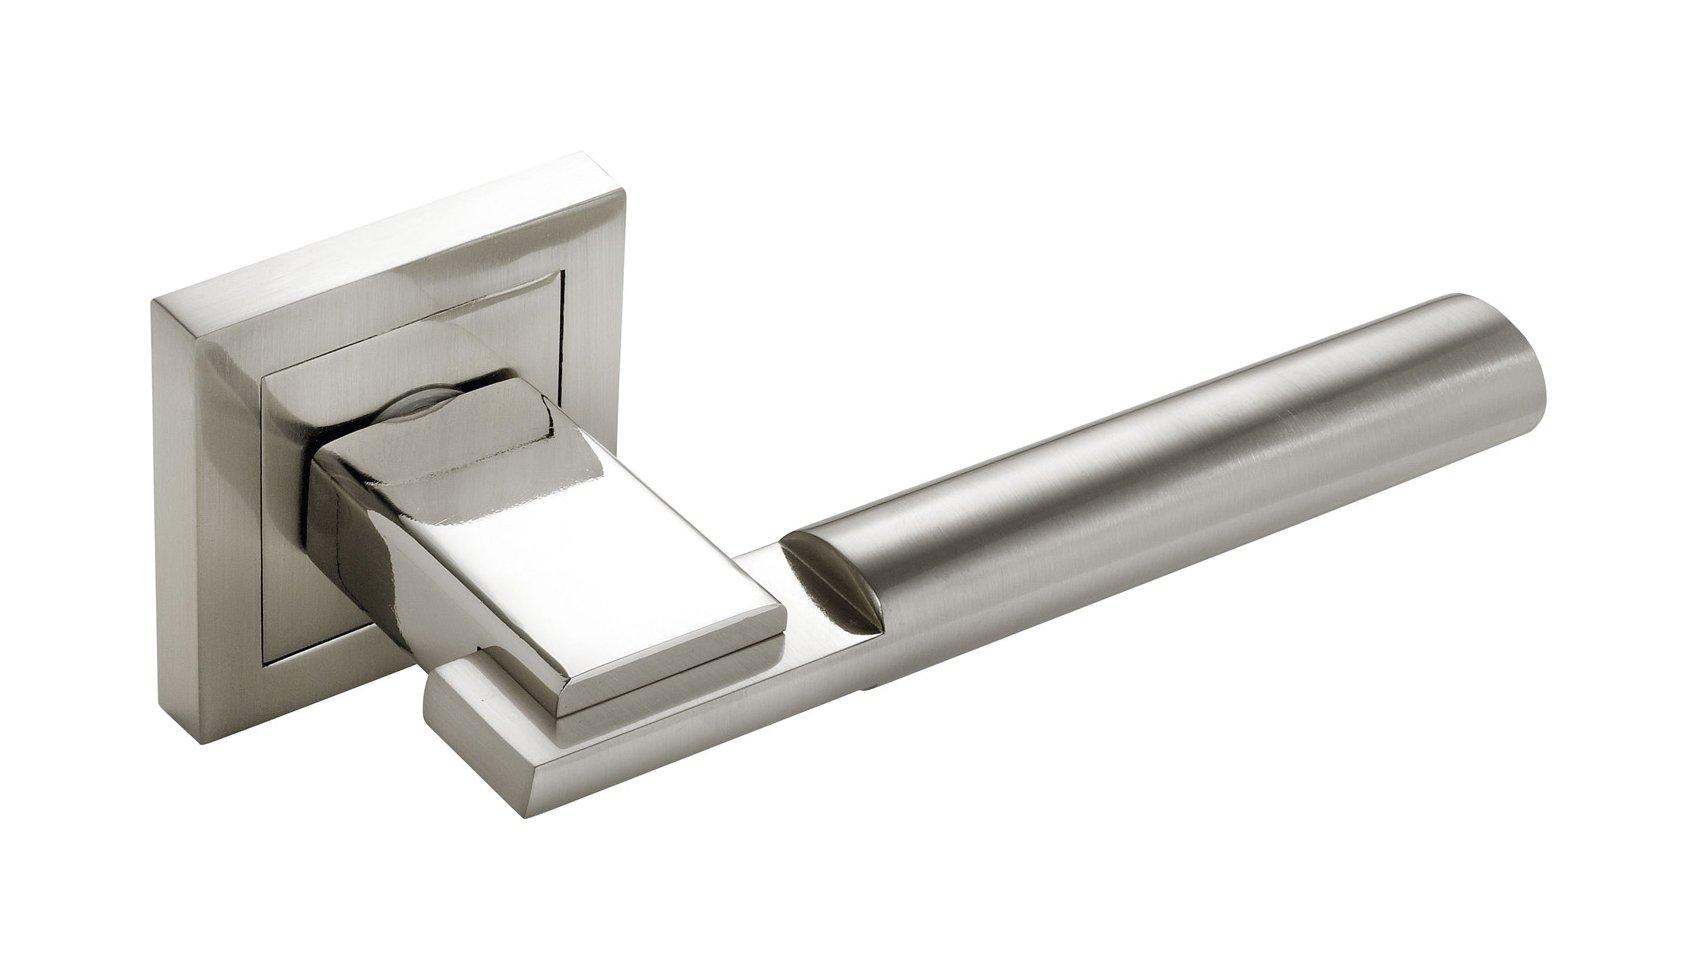 Aluminio manivelas para puertas carvi - Manilla puerta aluminio ...